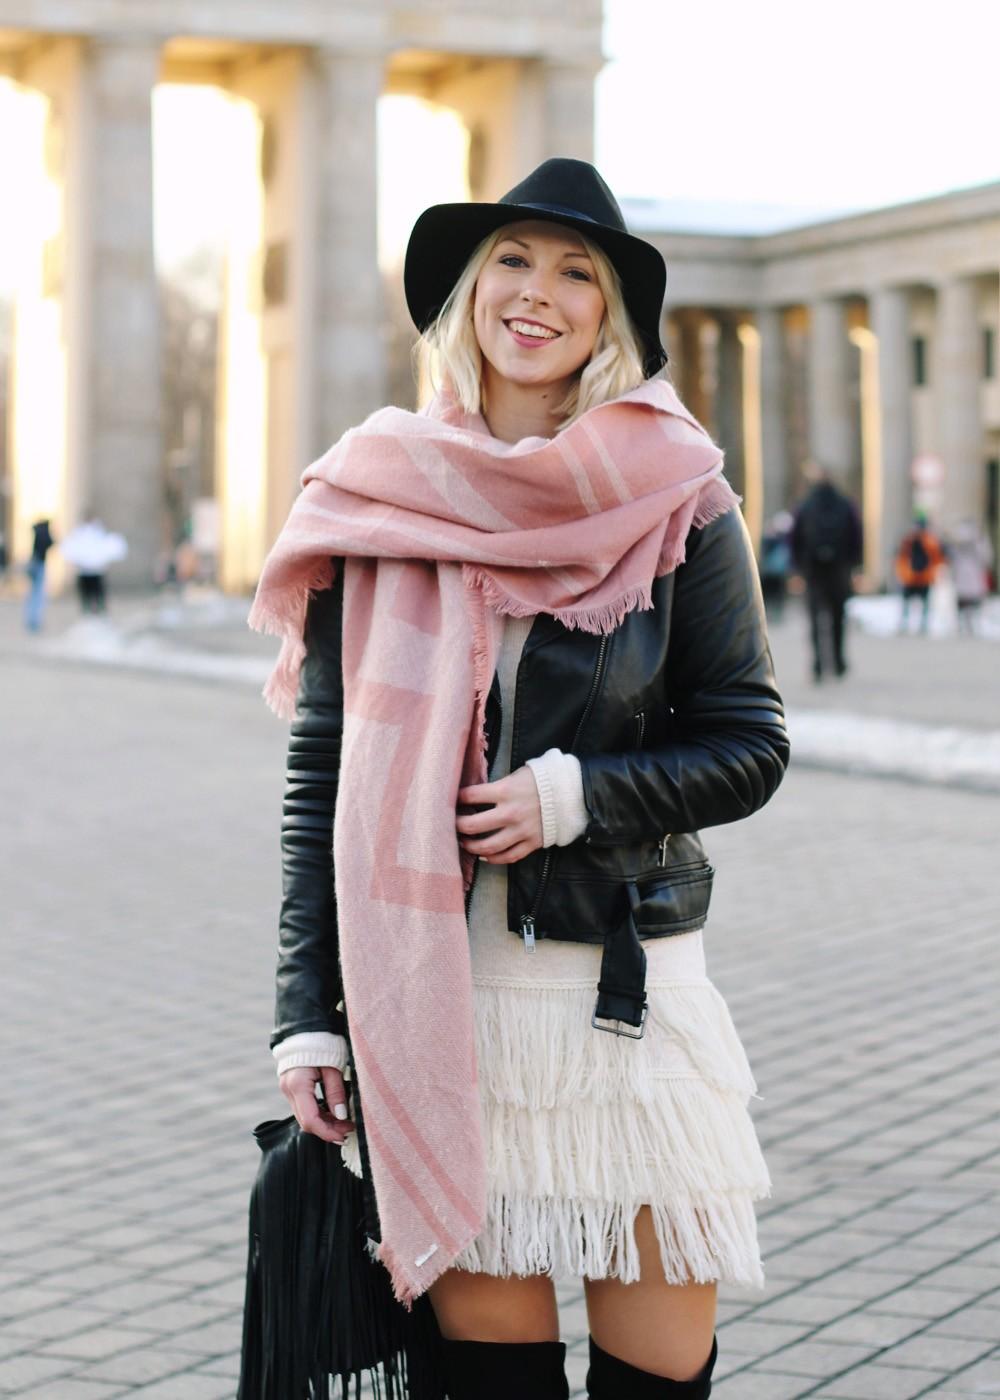 Fashion Week Berlin 2016 Outfit OOTD Fransen Strickkleid Lederjacke Overknees Schal Hut Fransentasche 17